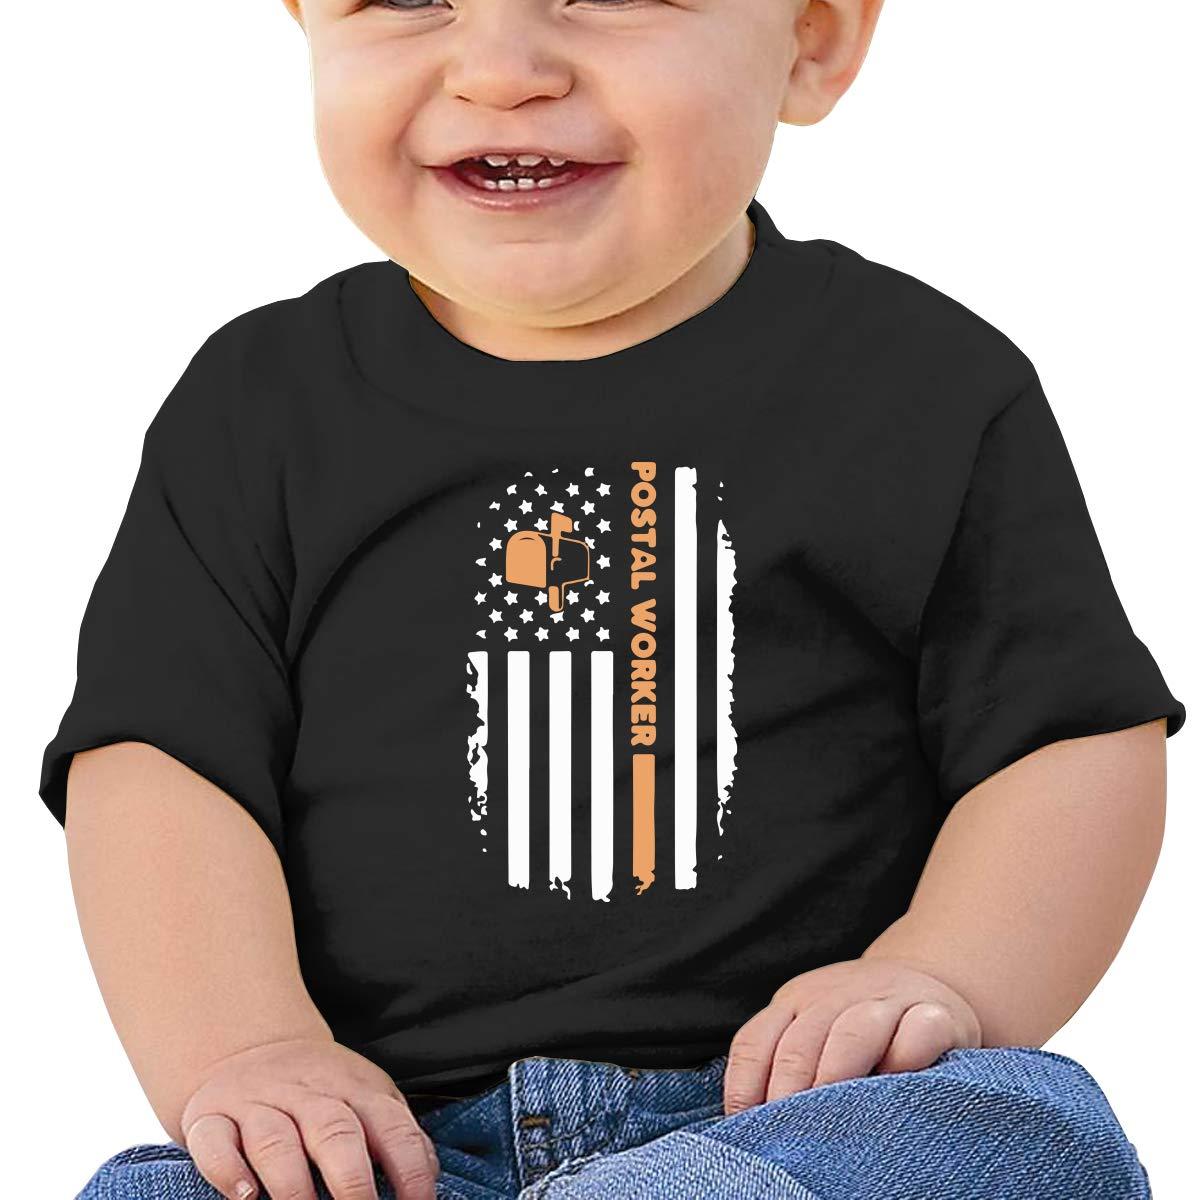 Postal Worker Flag Toddler Short-Sleeve Tee for Boy Girl Infant Kids T-Shirt On Newborn 6-18 Months